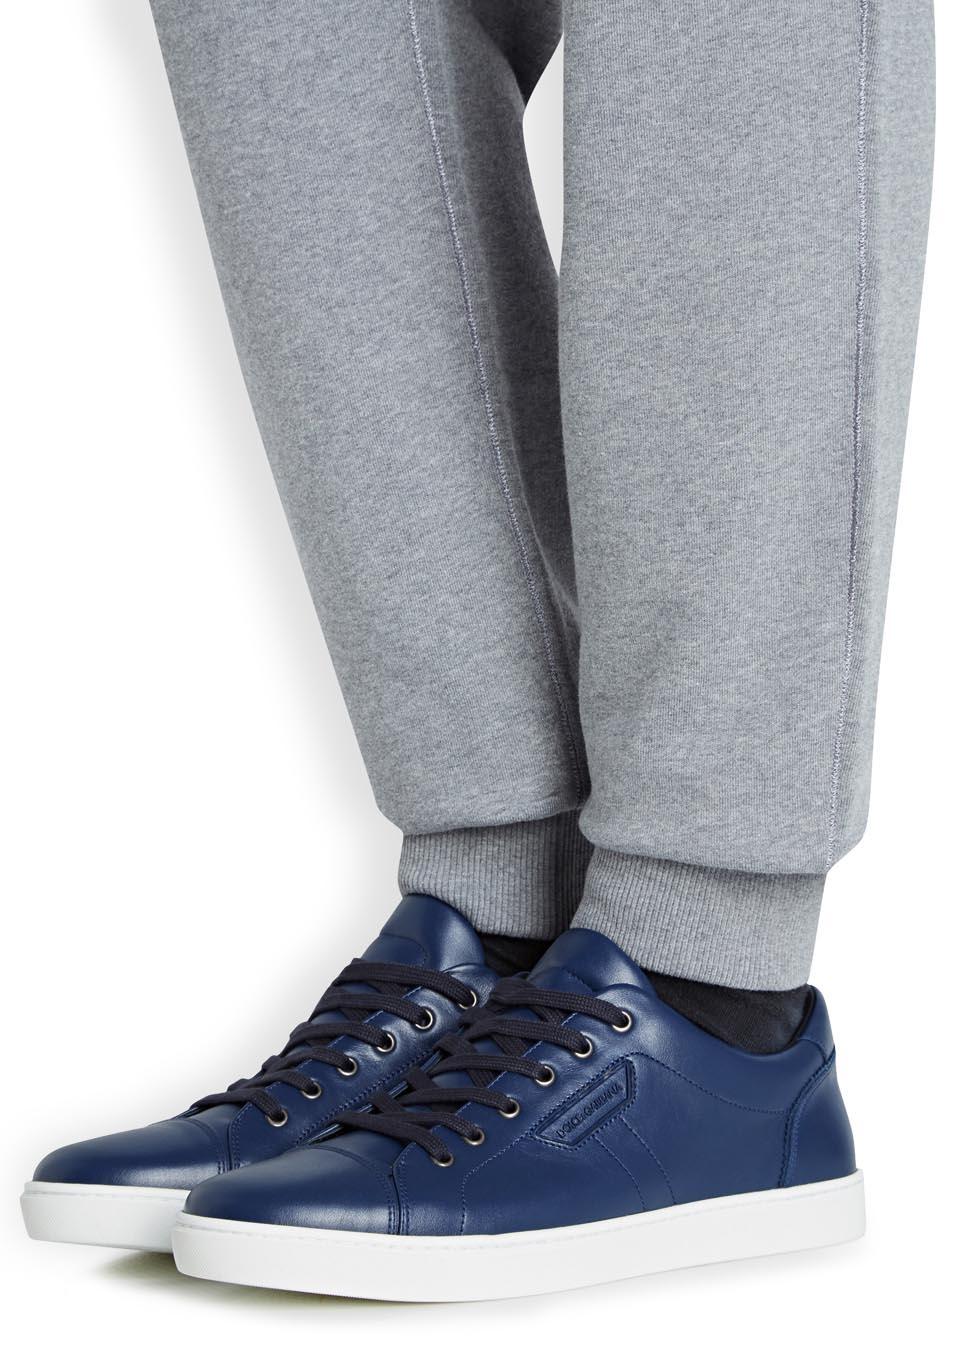 London sneakers - Grey Dolce & Gabbana POM6Q4dC